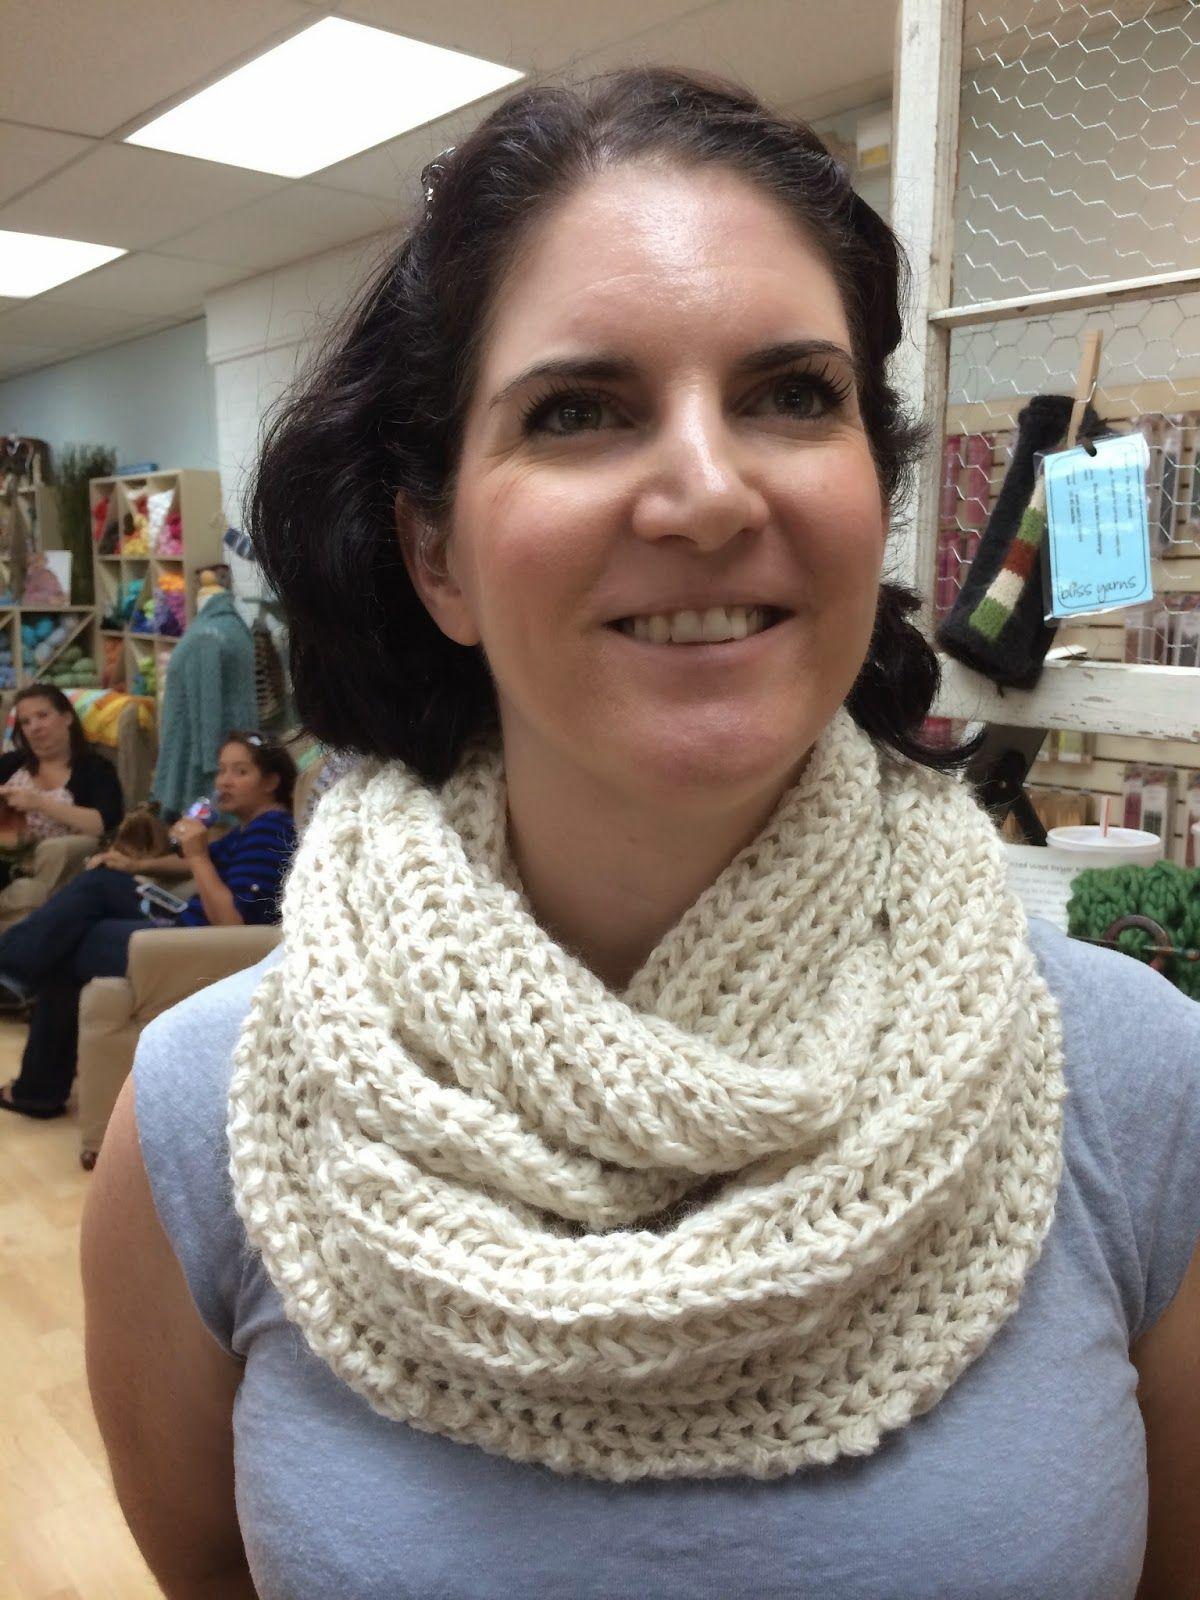 Brioche Rib Infinity   Infinity scarf knitting pattern ...